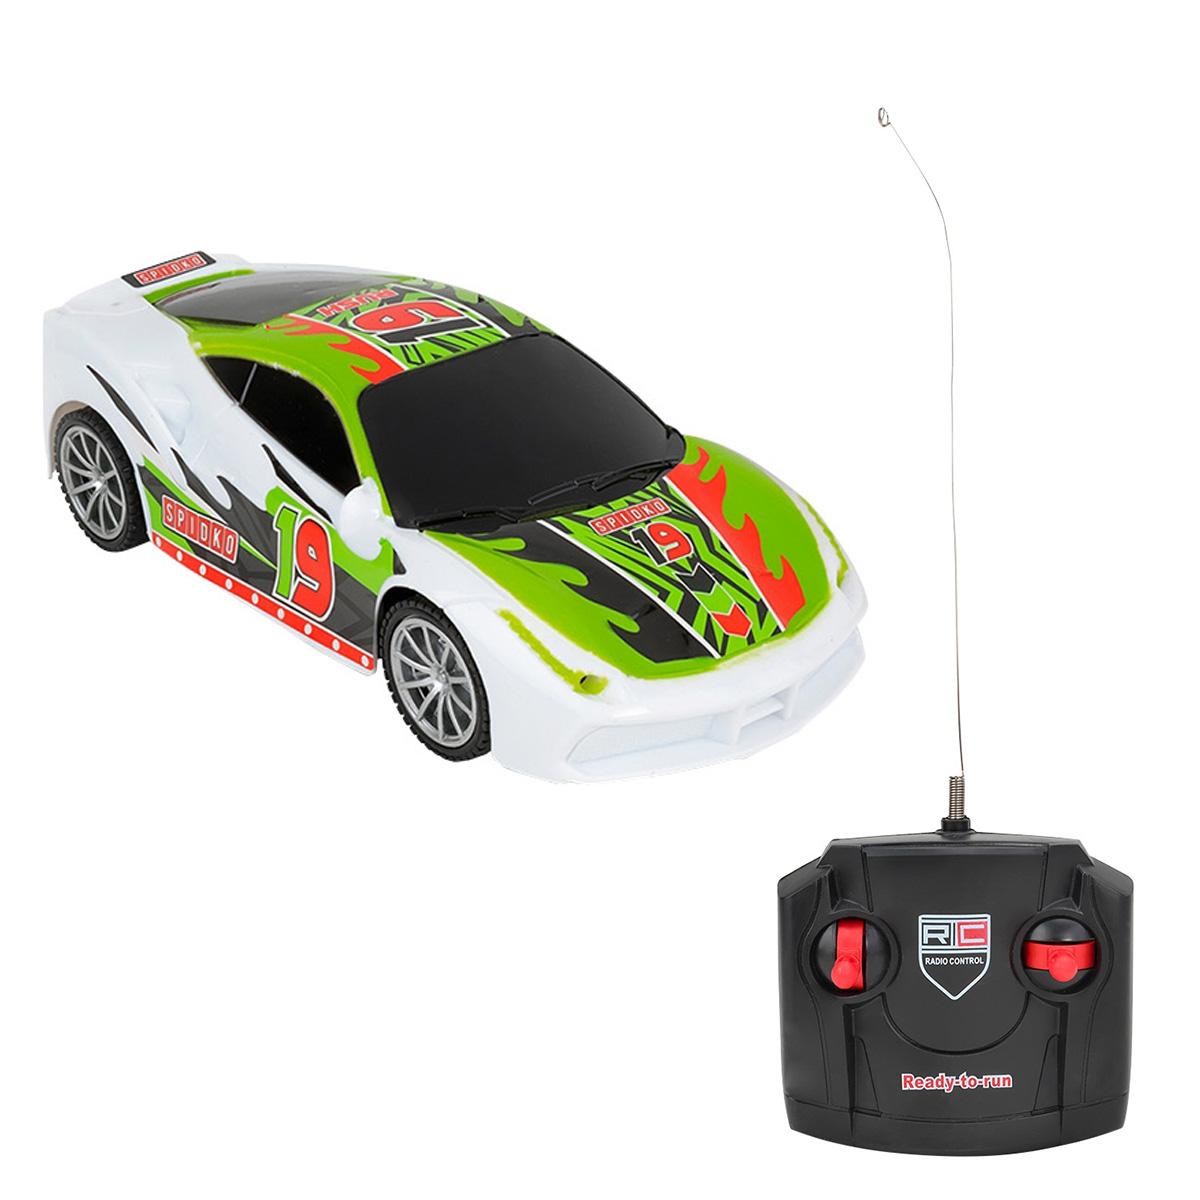 Masinuta cu telecomanda Globo Racing Car, Verde